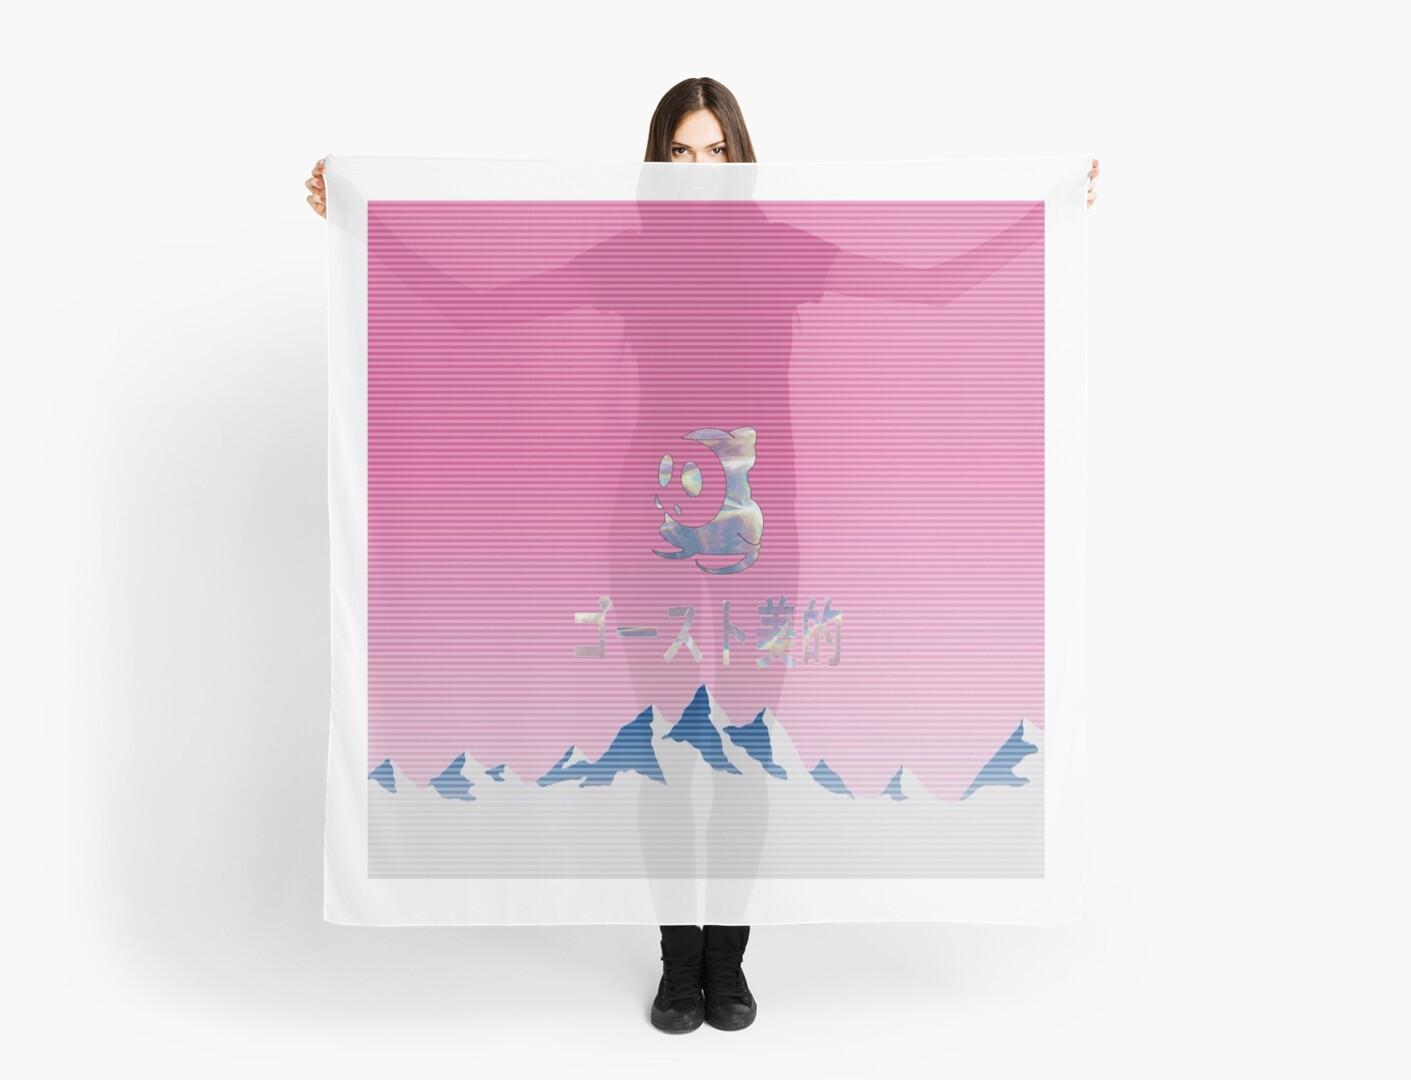 Aesthetic Vaporwave Super Ghost by RMorra